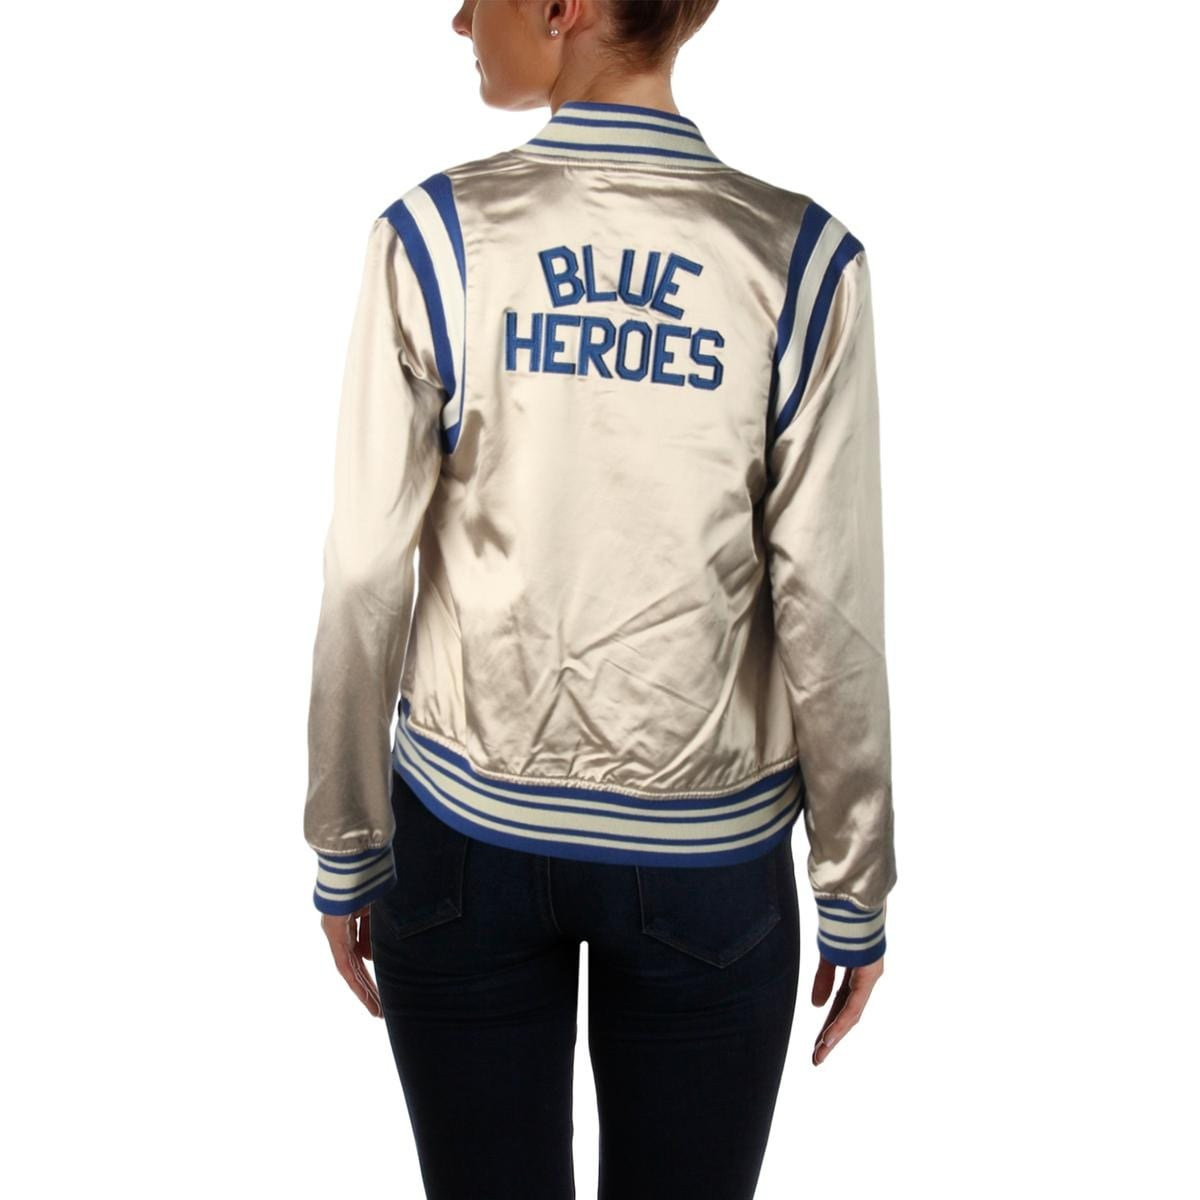 94caf92b7 Scotch & Soda Womens Blue Heroes Bomber Jacket Silky Sporty